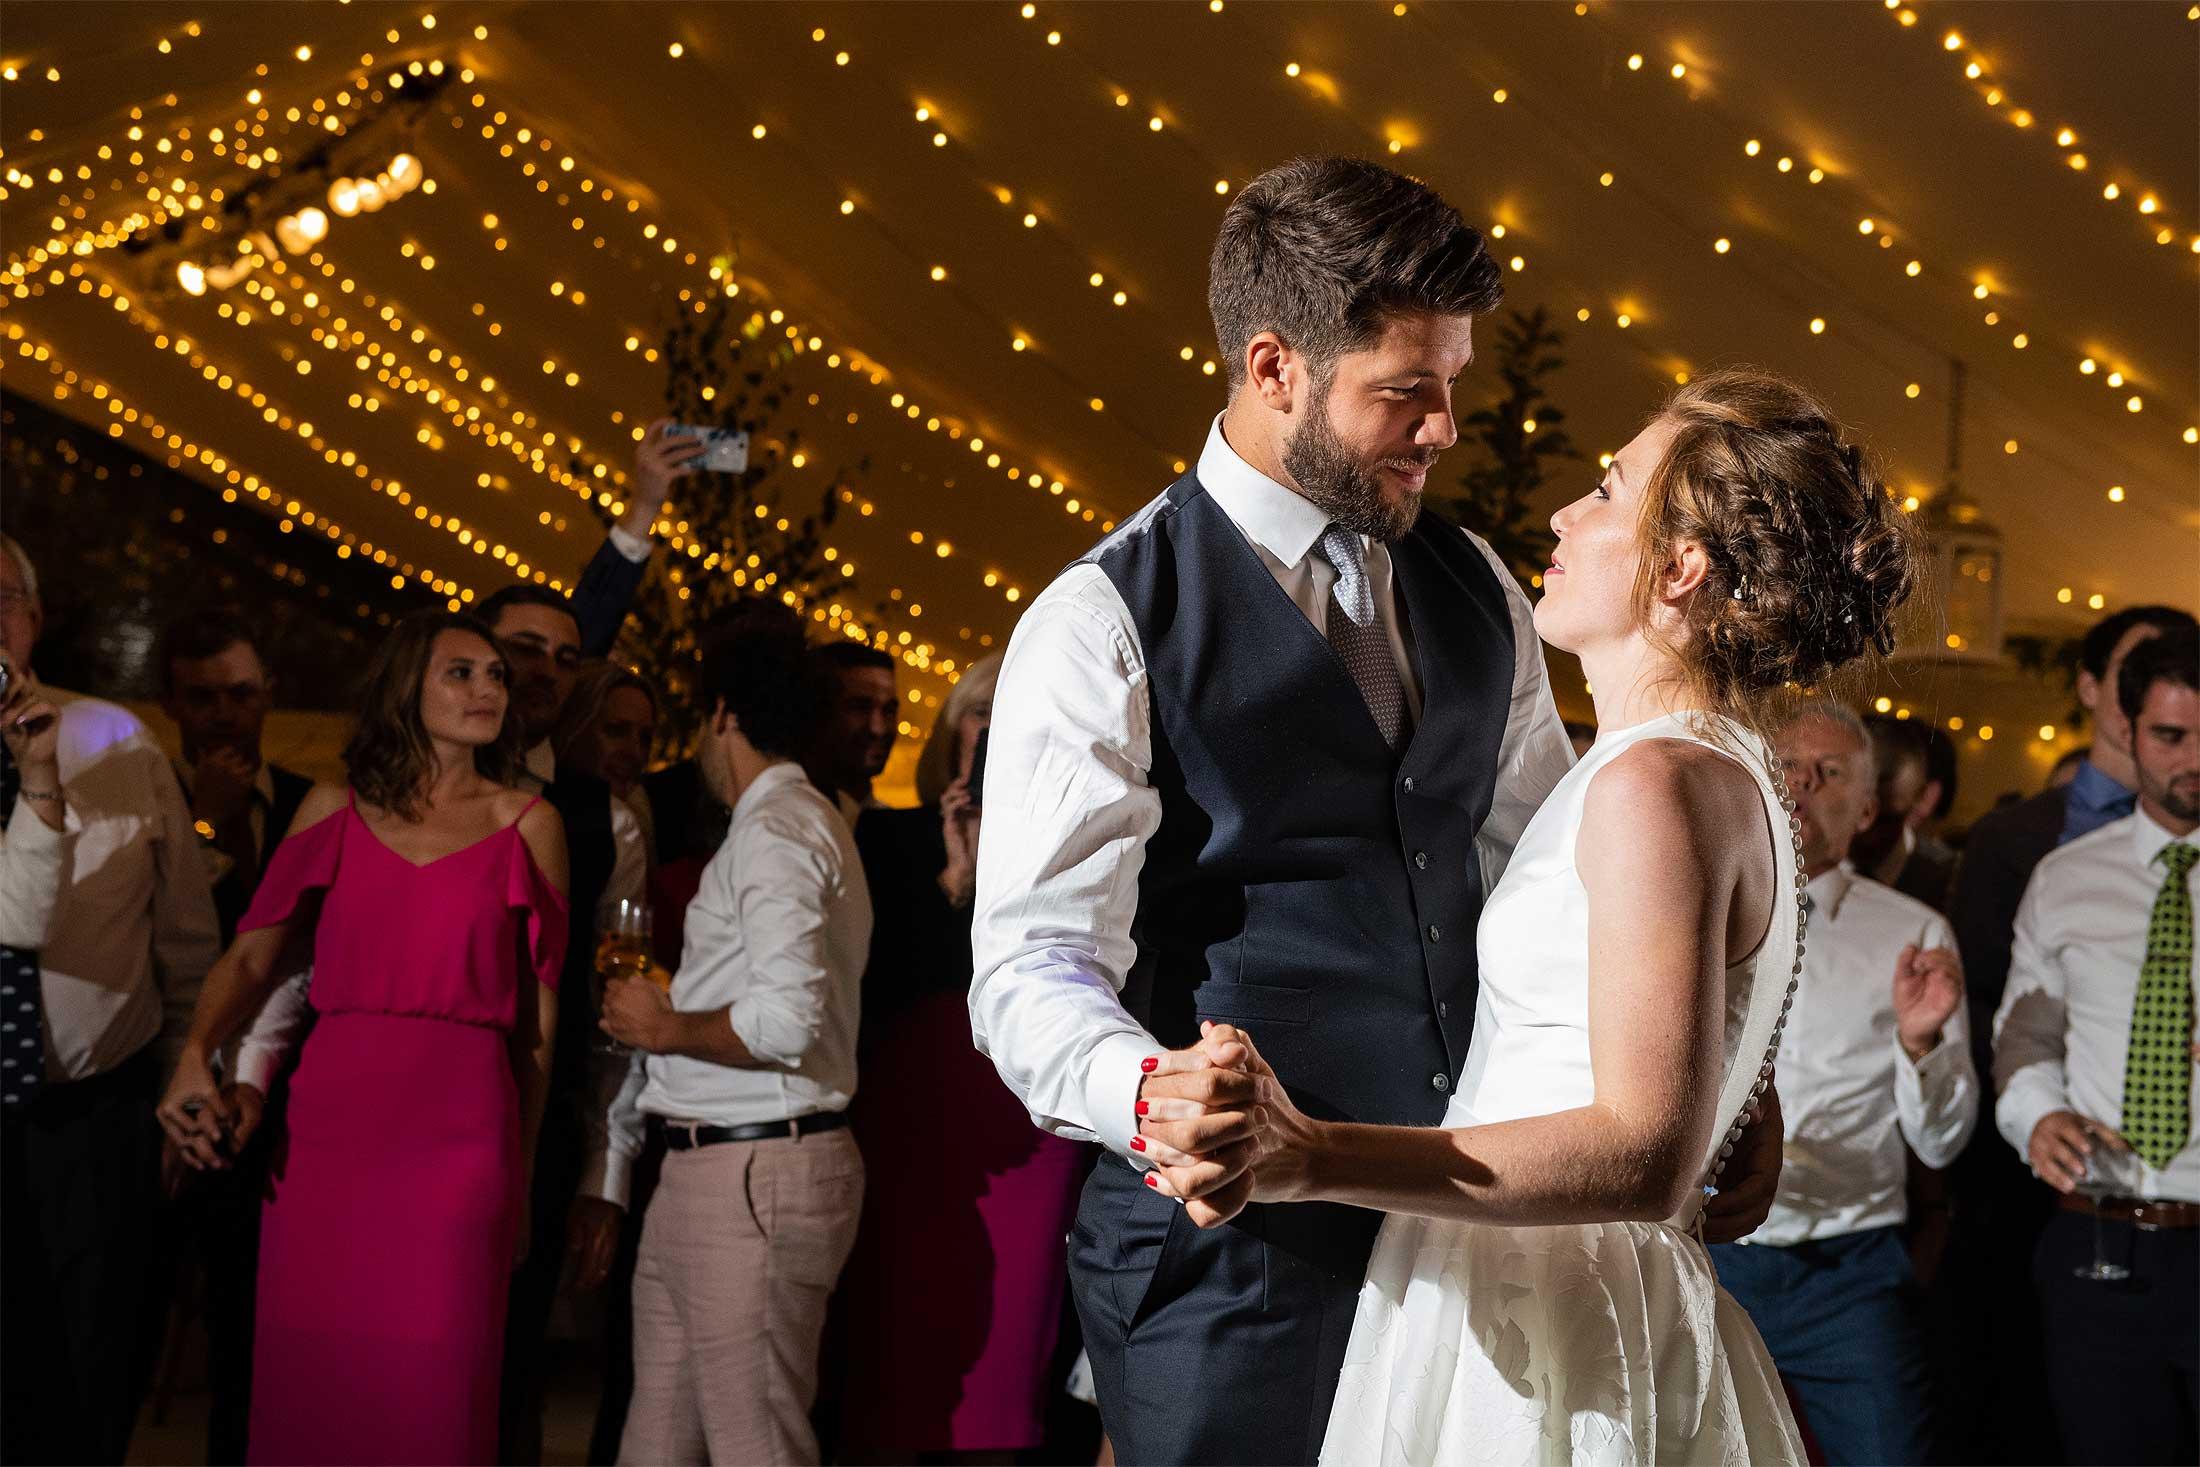 Wedding first dance photo